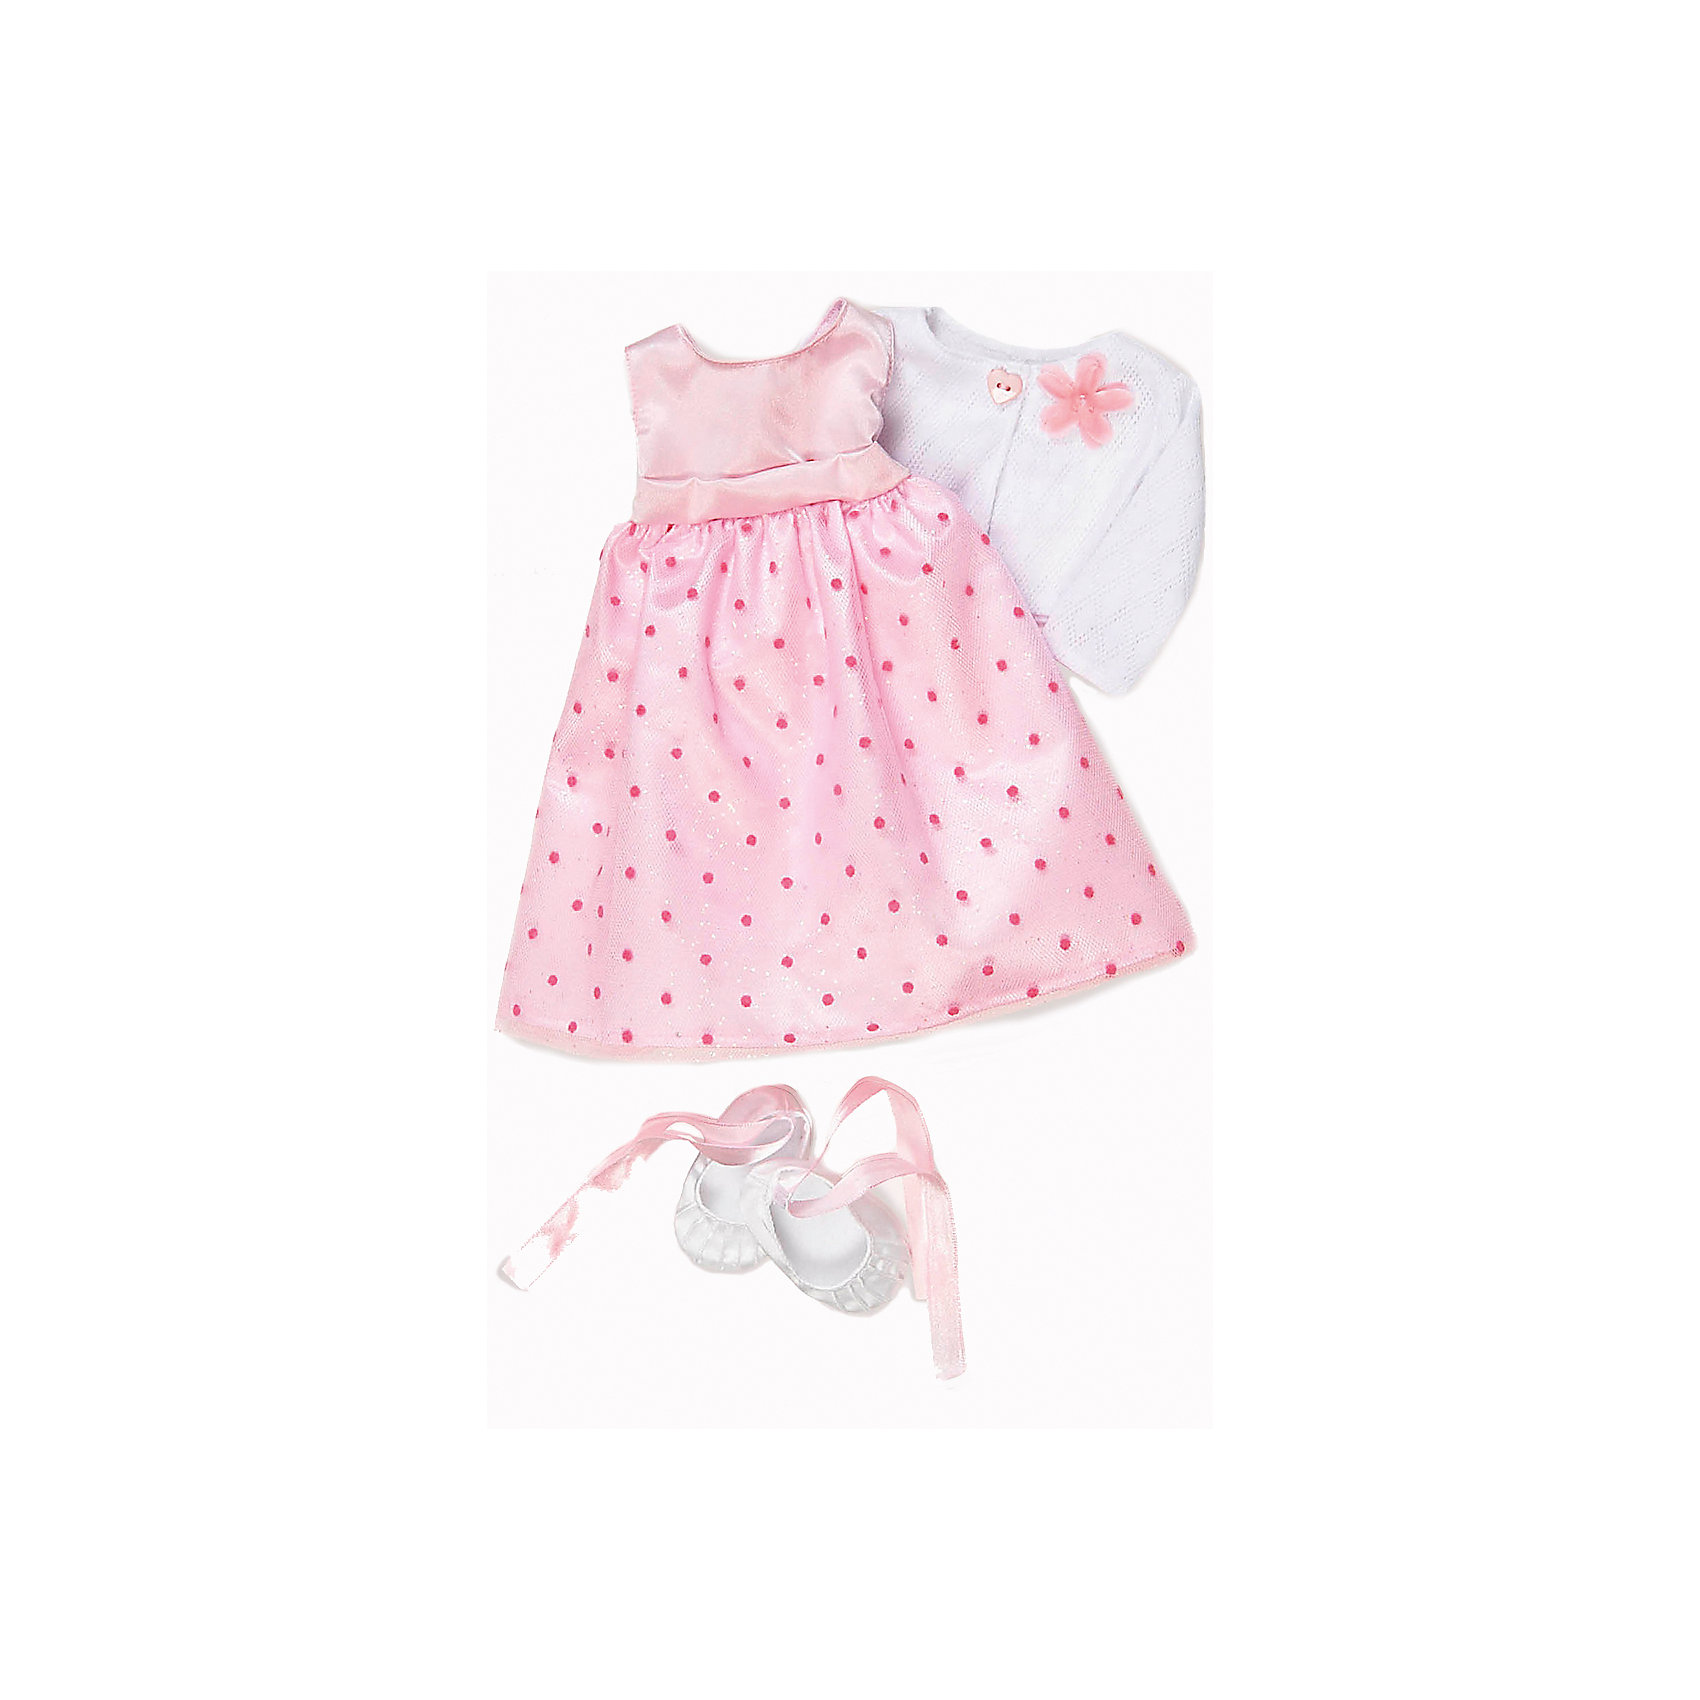 Our Generation Dolls Одежда делюкс для куклы, 46 см, Our Generation Dolls цены онлайн